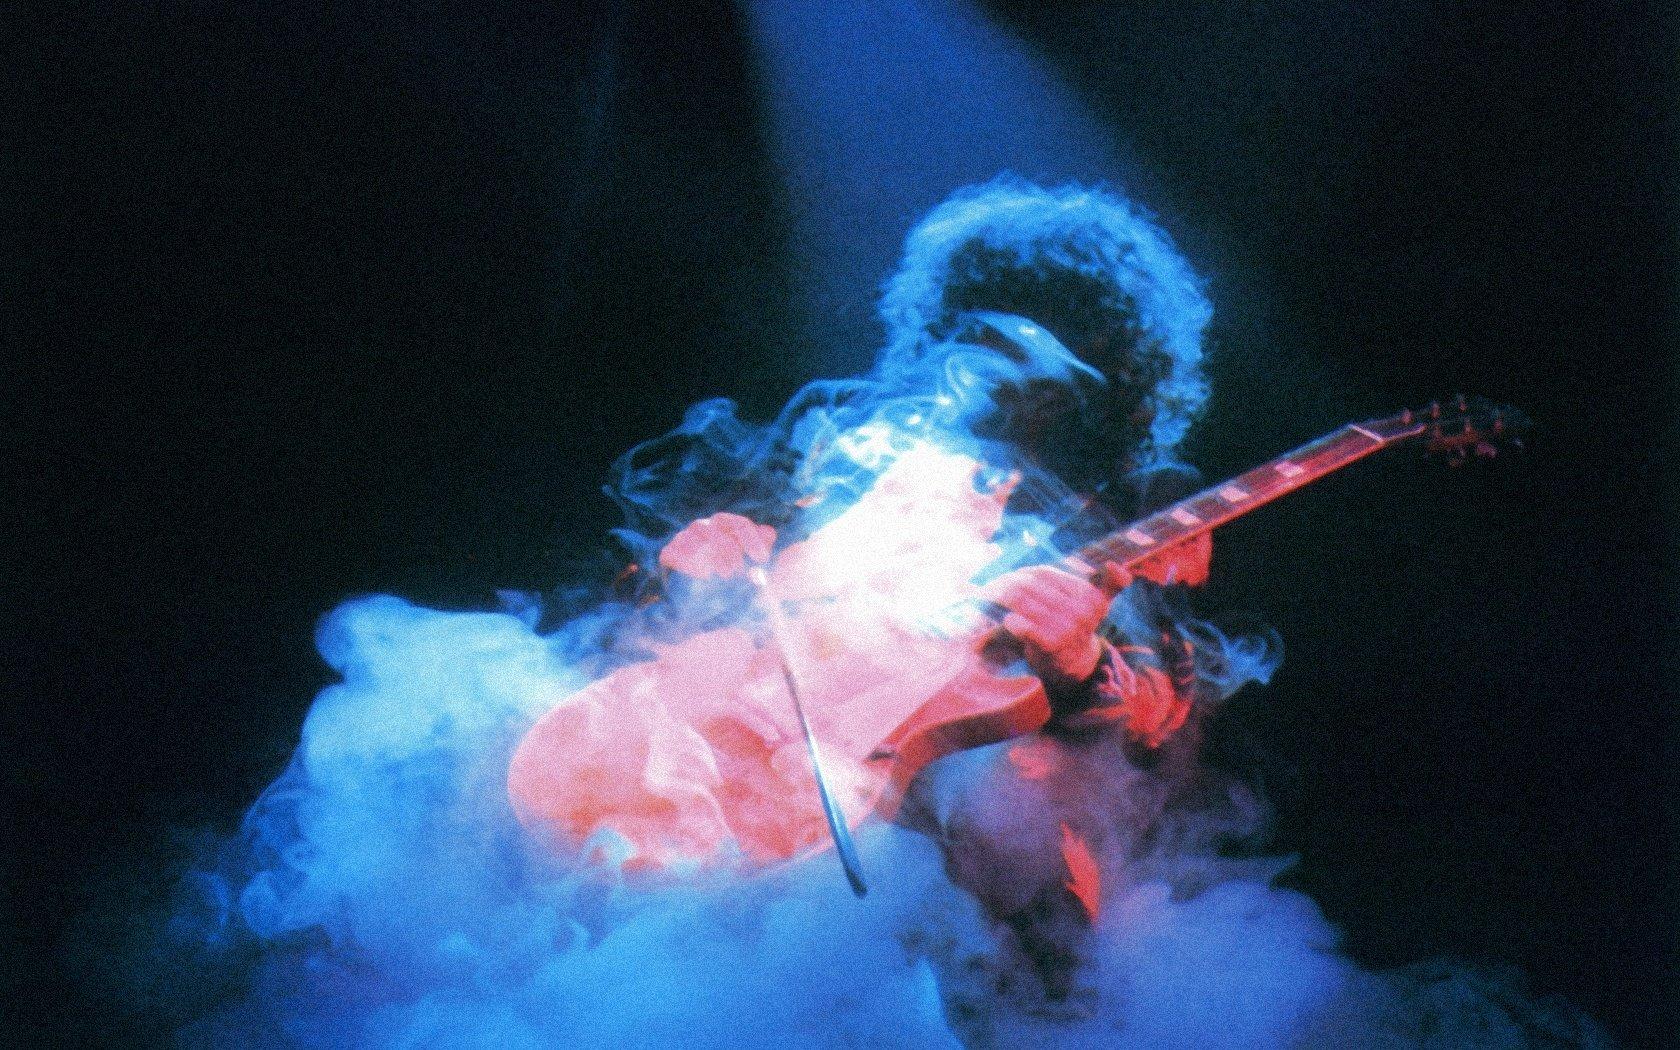 Smoke Jimmy Page musican wallpaper 1680x1050 307415 WallpaperUP 1680x1050